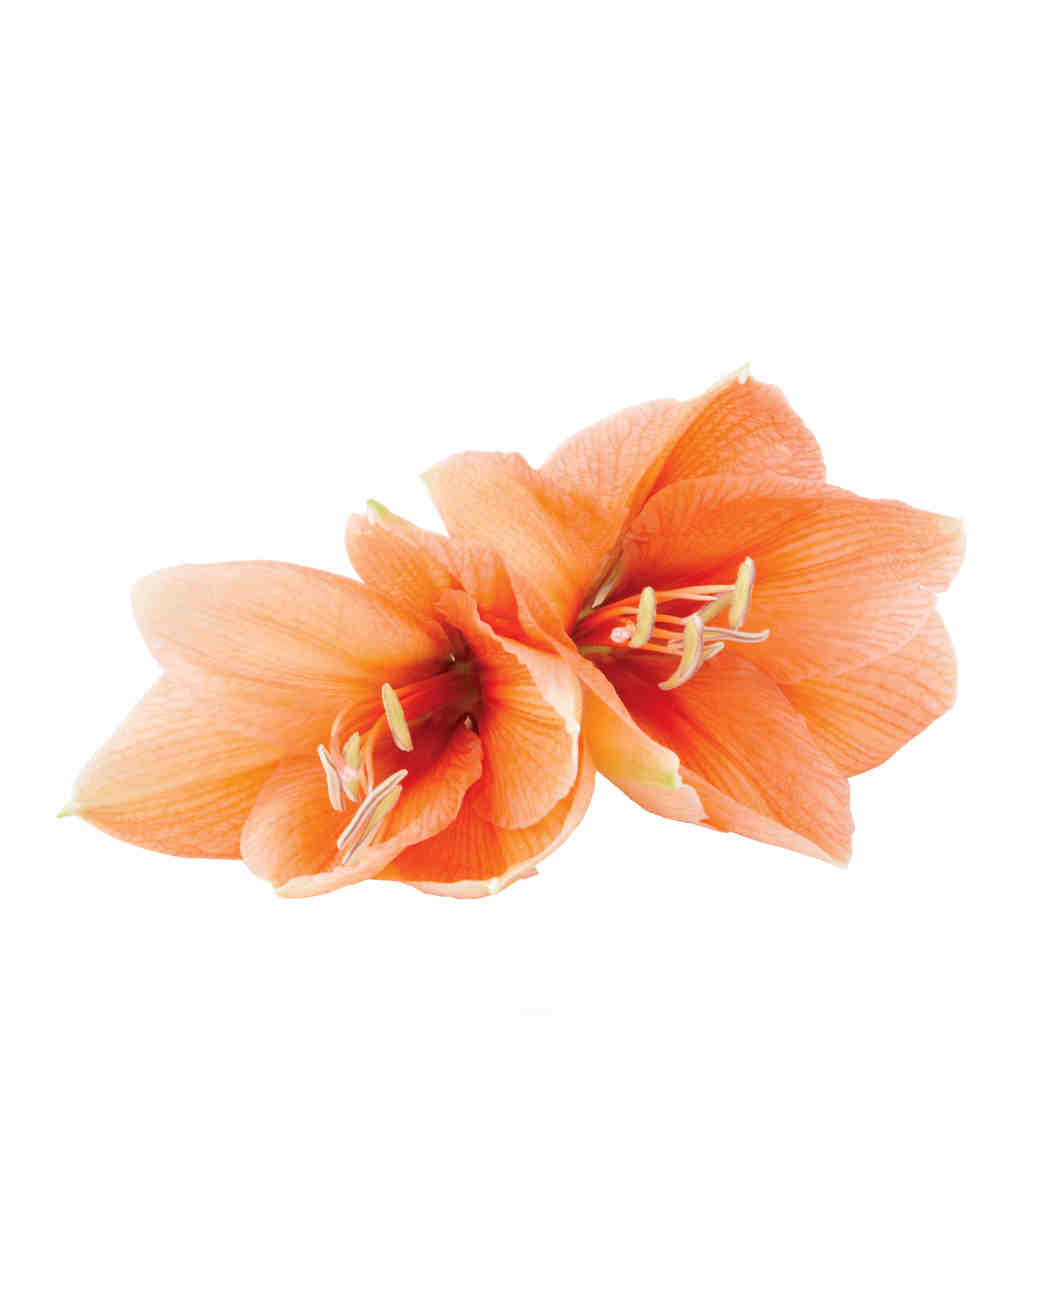 amaryllis-mwd107931.jpg